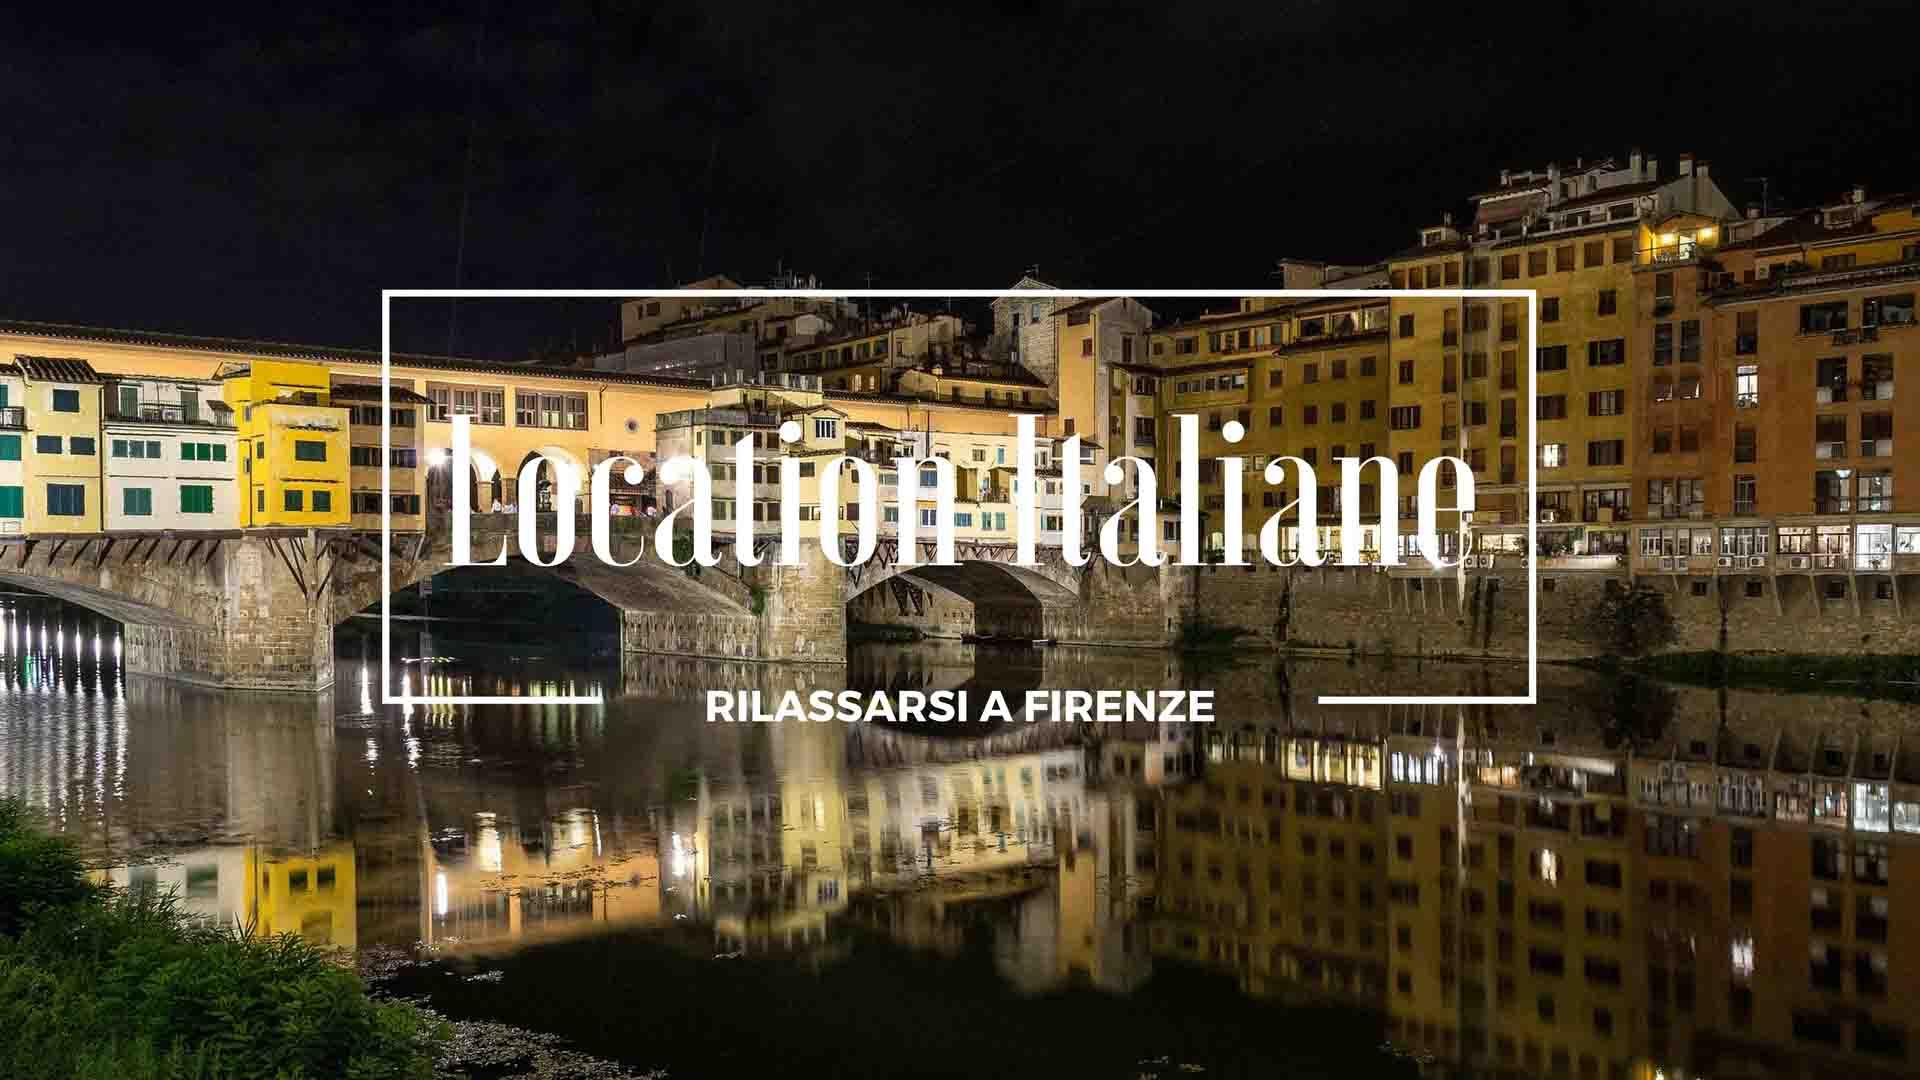 Rilassarsi a Firenze